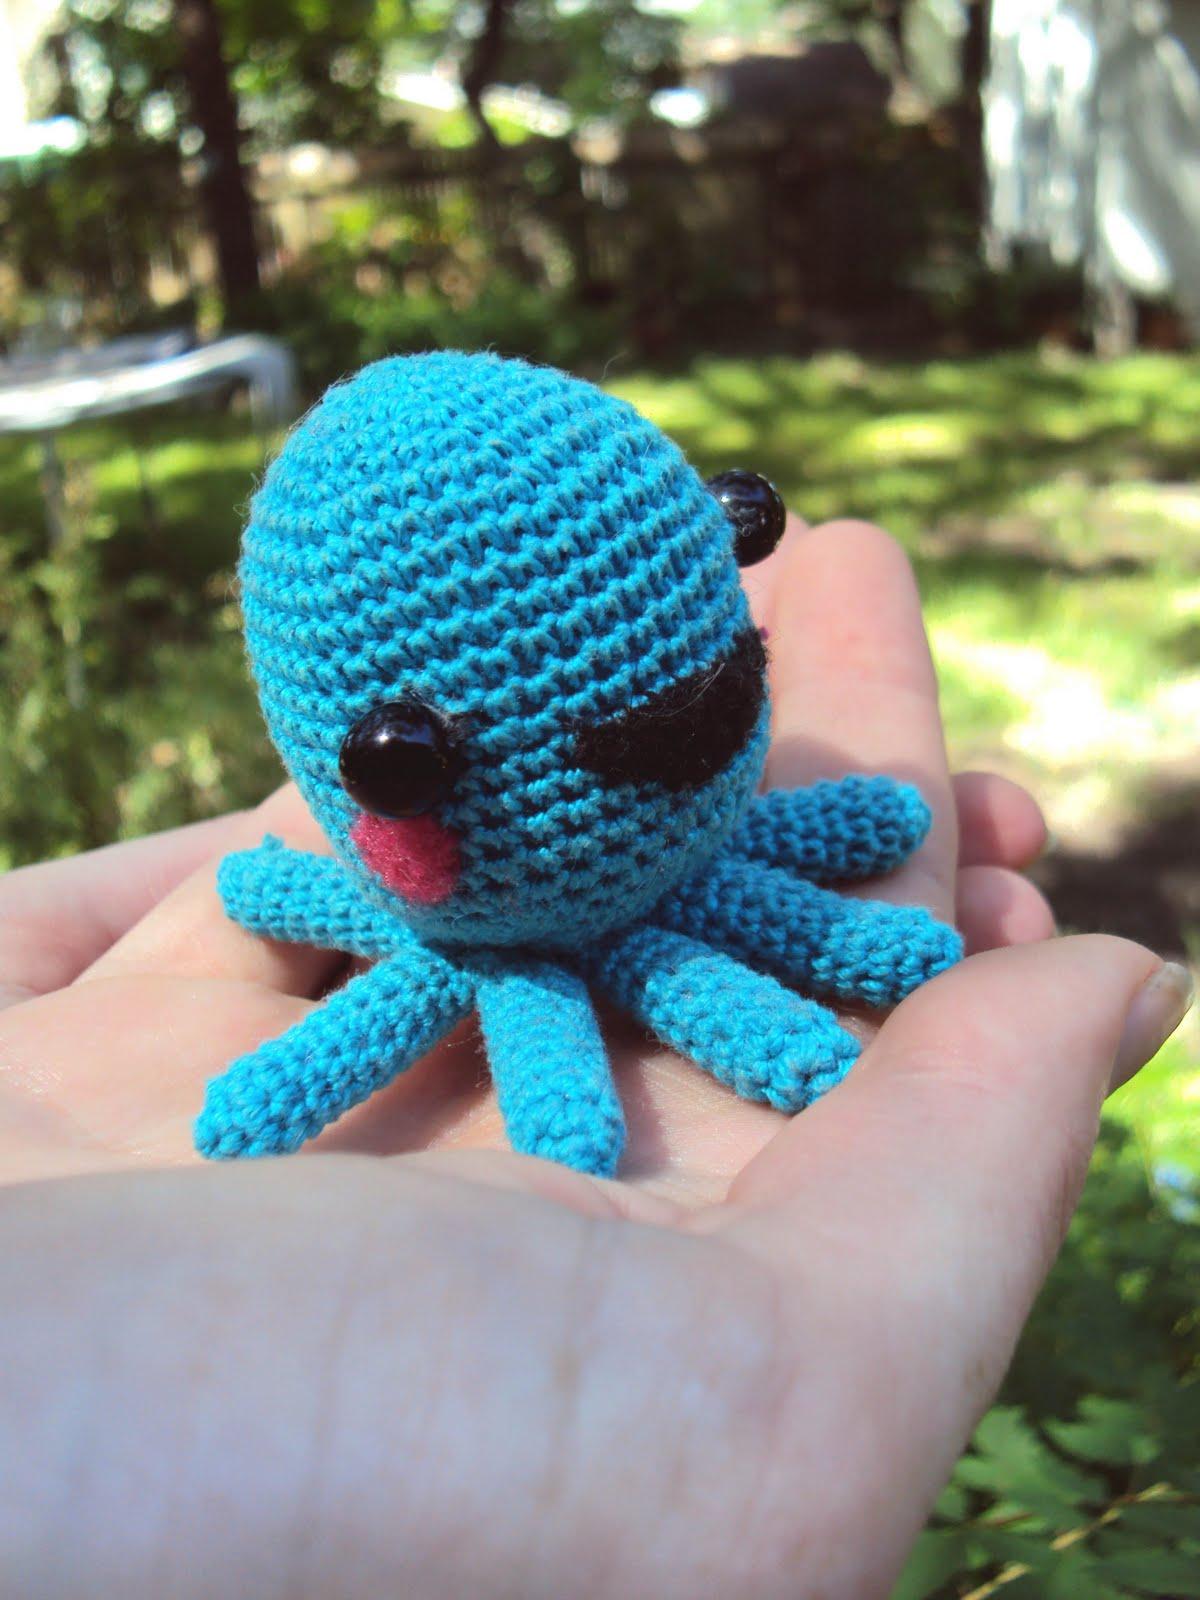 Amigurumi World Seriously Cute Crochet : Amigurumi World Seriously Cute Crochet By Ana Paula 2017 ...